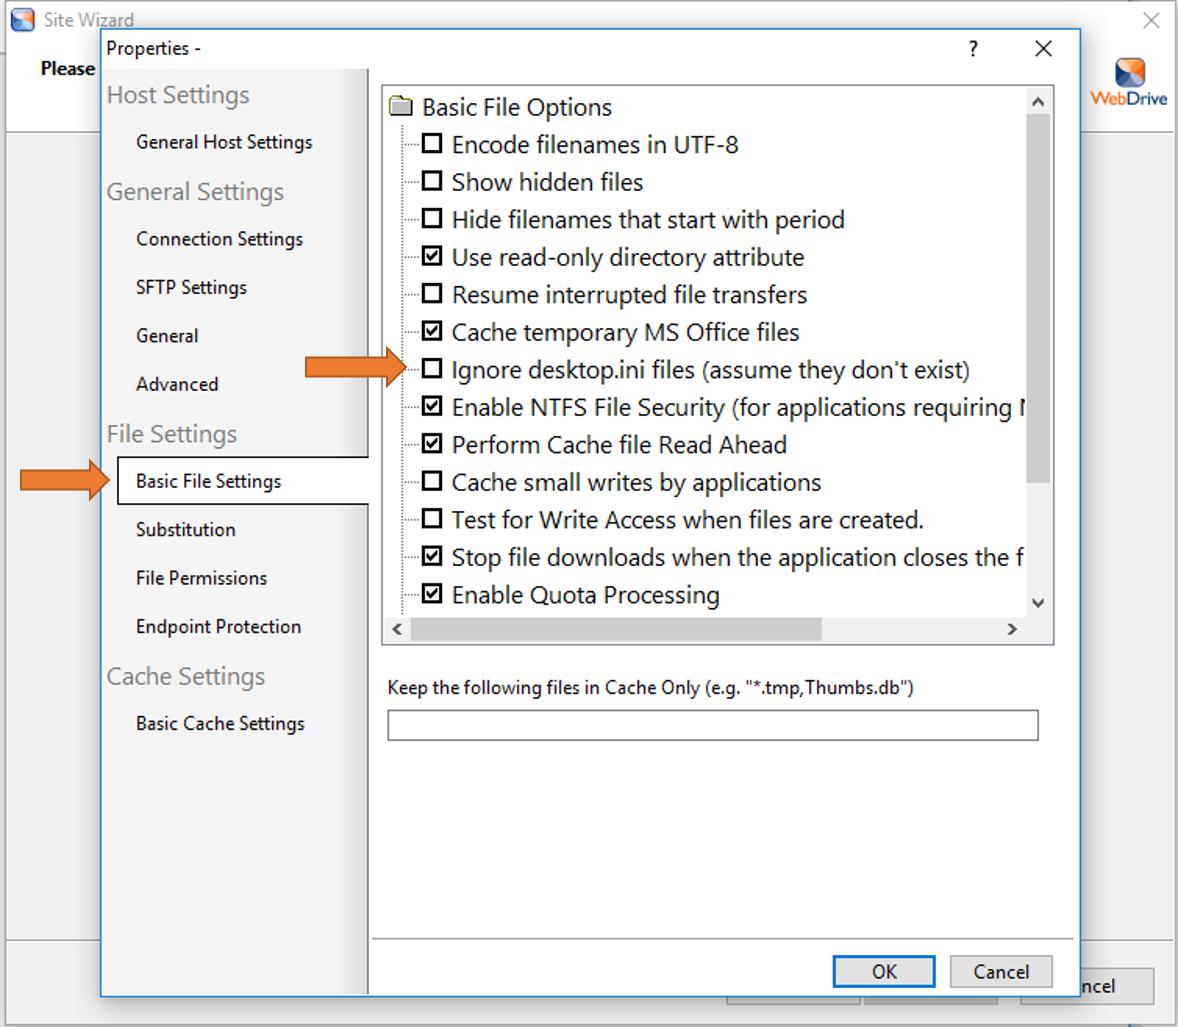 WebDrive Advanced Settings